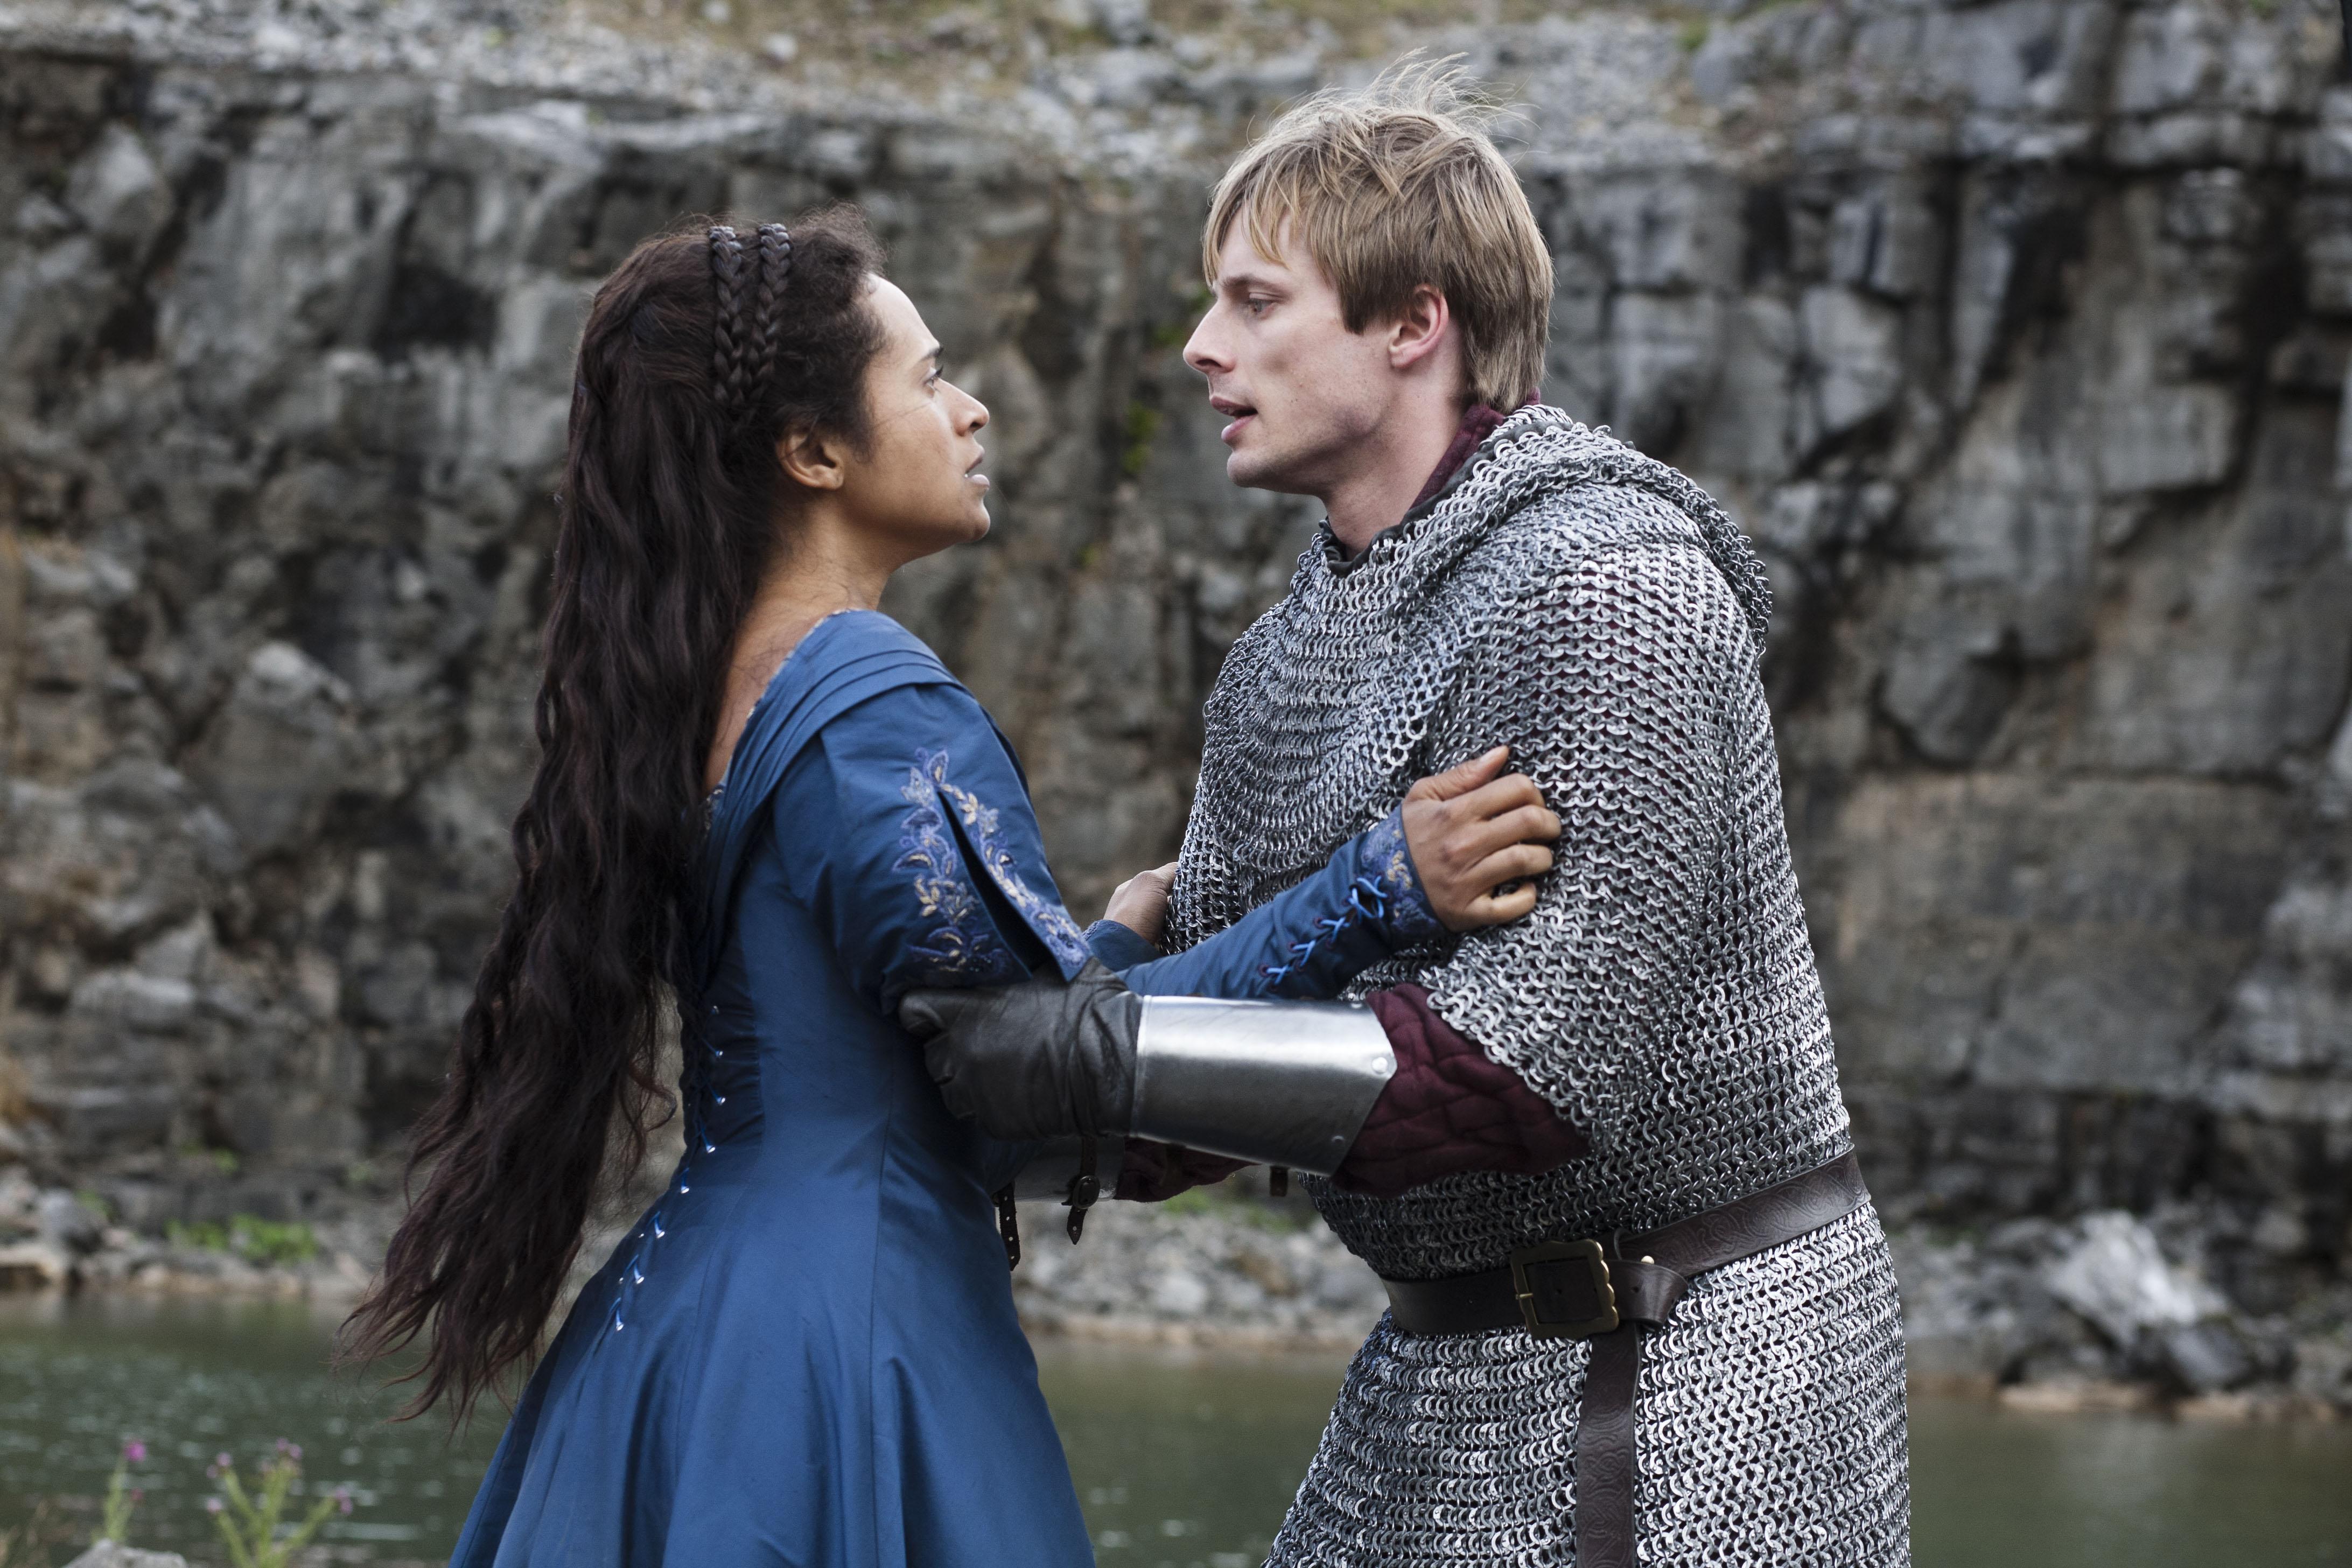 Can Merlin save Gwen?